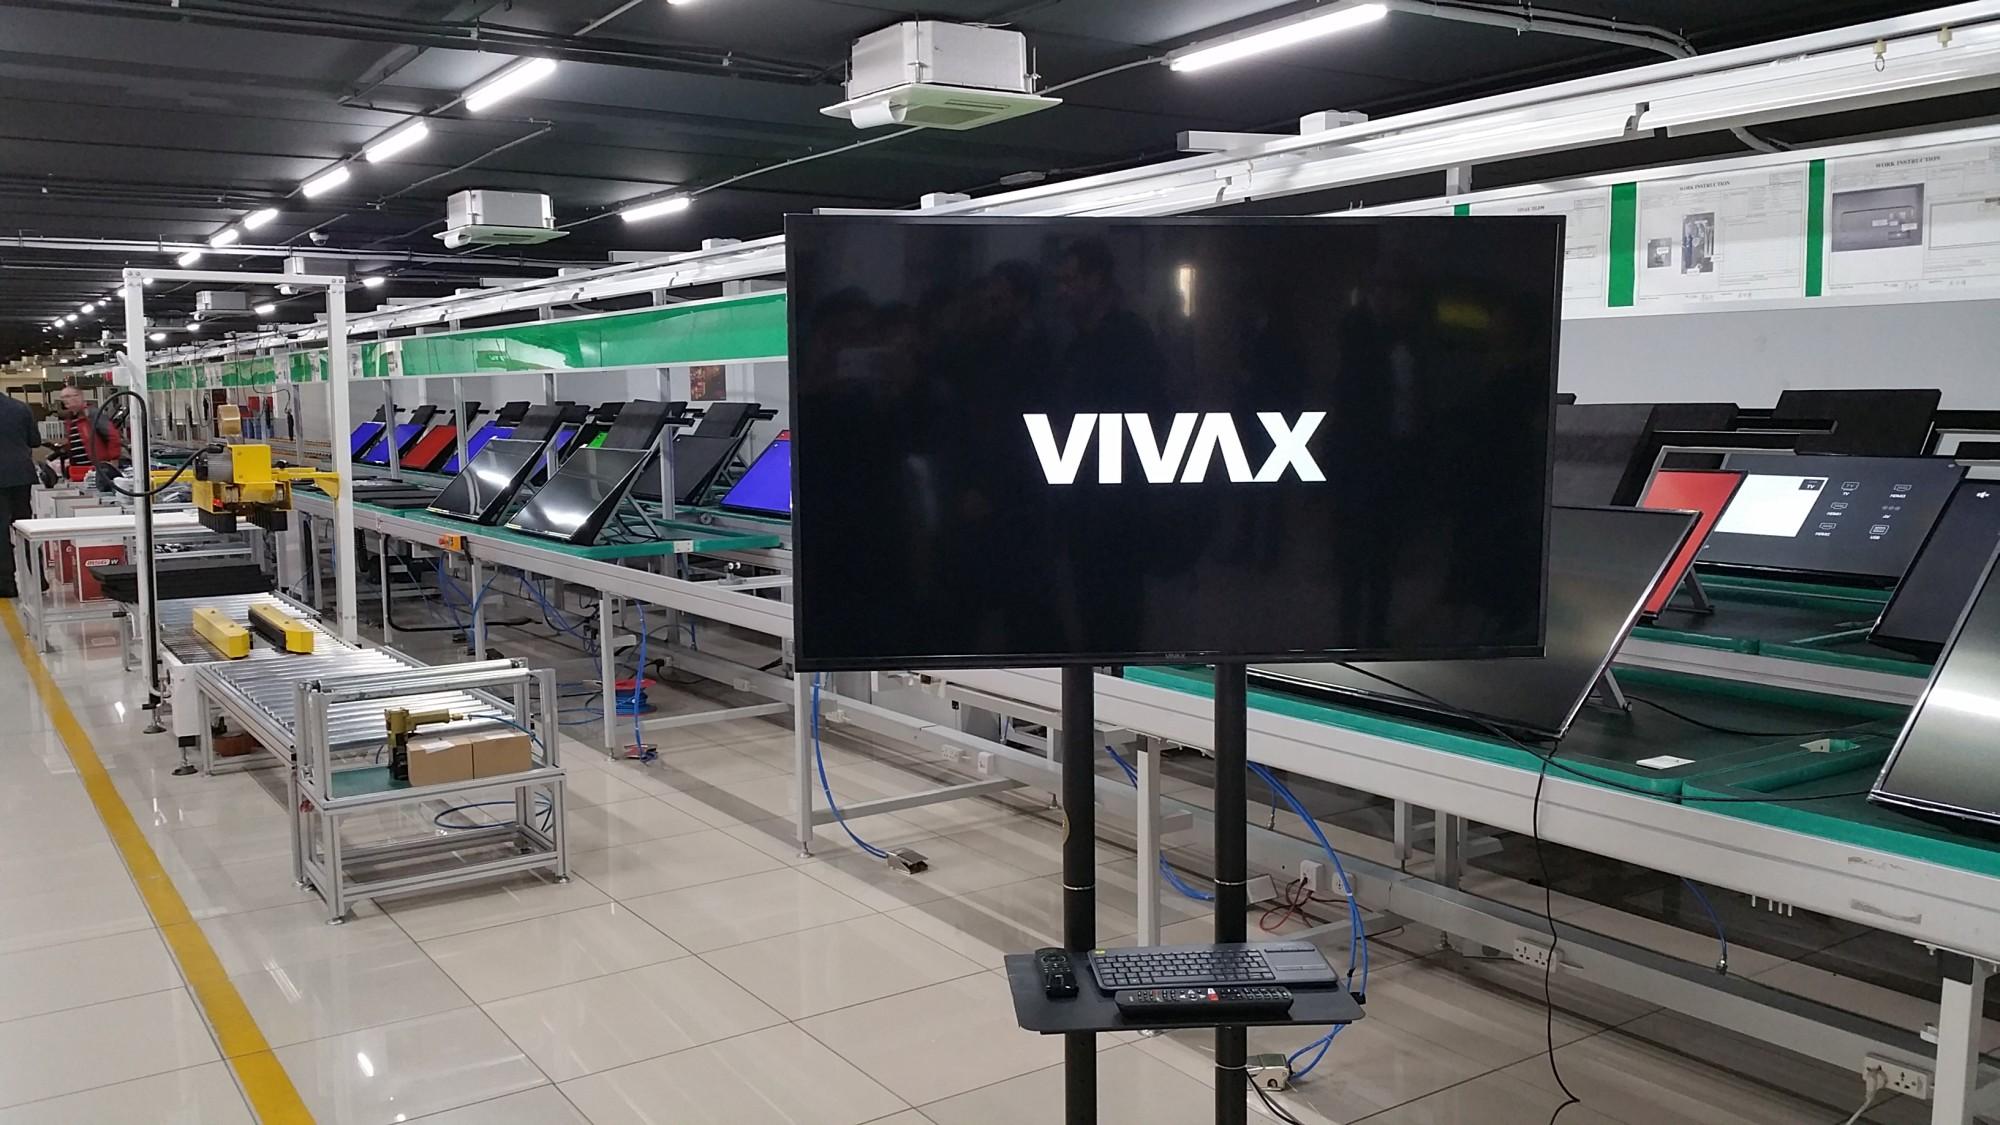 Vivax smart tv 3